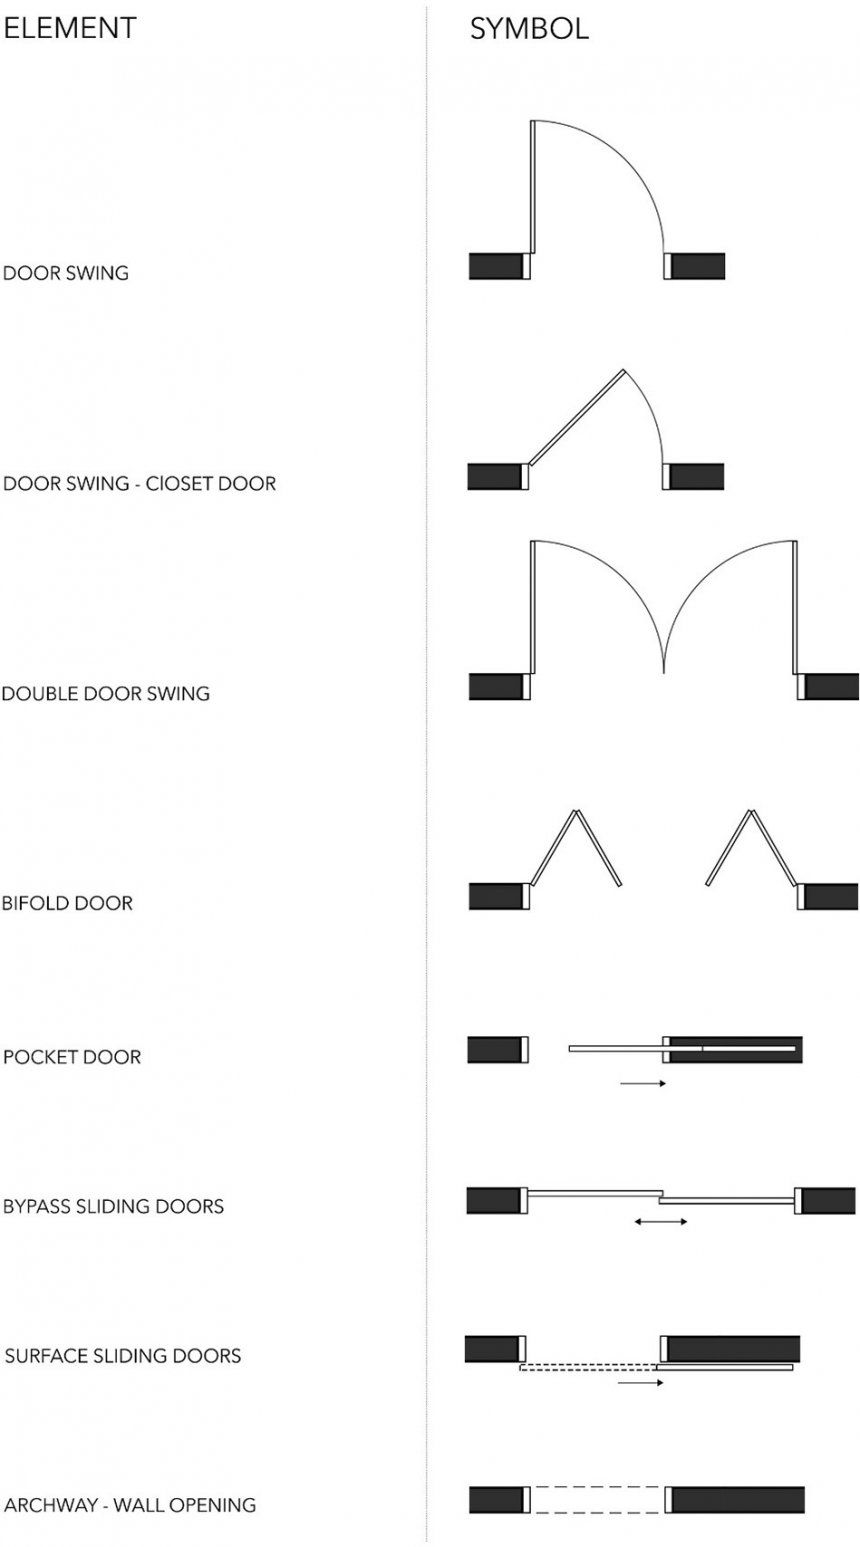 Basic Elements Of Interior Design Pdf Fancy Extra Deep Sofa In Raphaels Bar For Your H Floor Plan Symbols Interior Architecture Design Interior Design Sketches